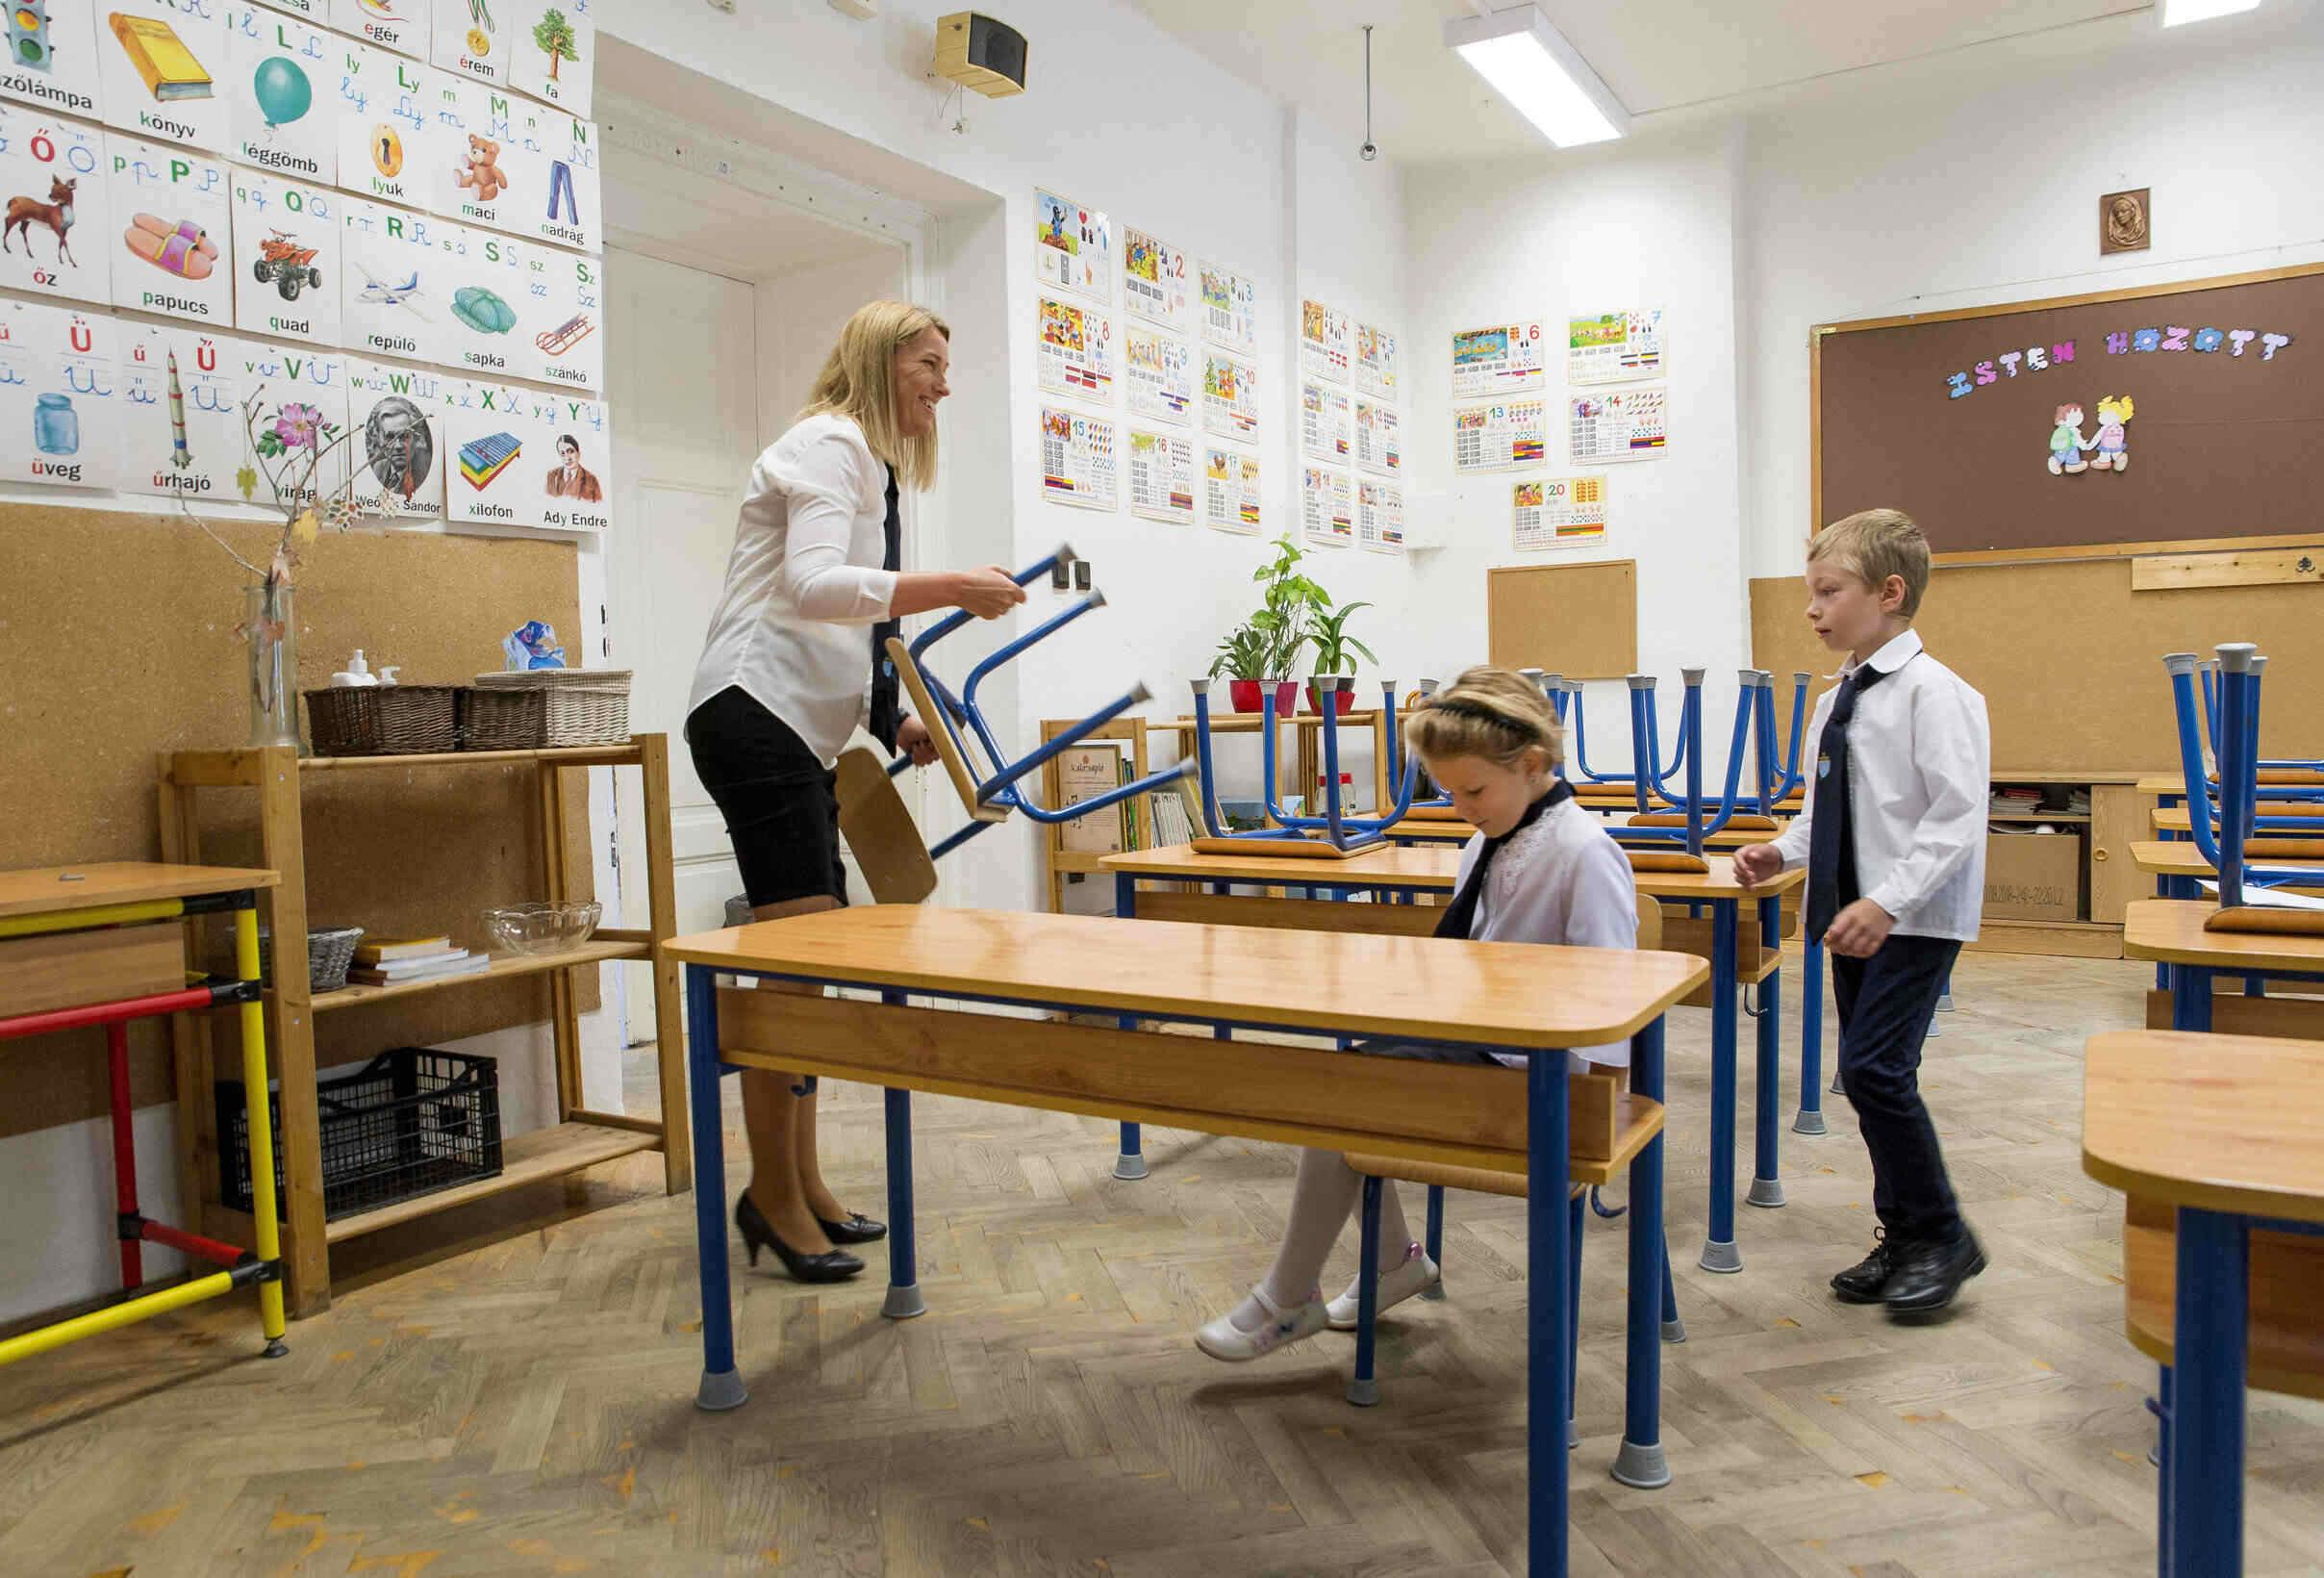 hungary school education